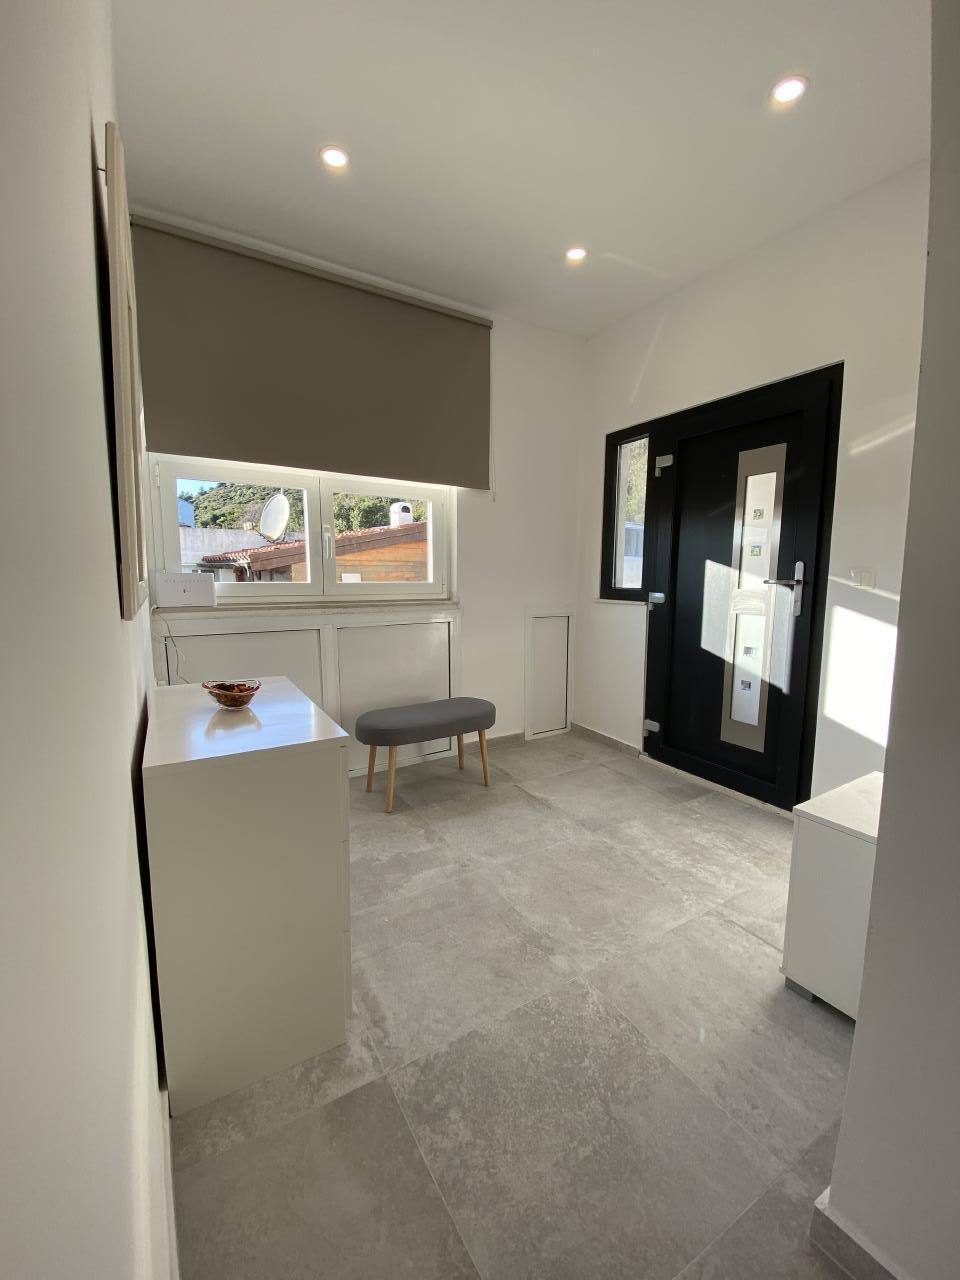 Ferienwohnung Casa Anica Apartment Bellevue (656993), Kuciste, Insel Peljesac, Dalmatien, Kroatien, Bild 14